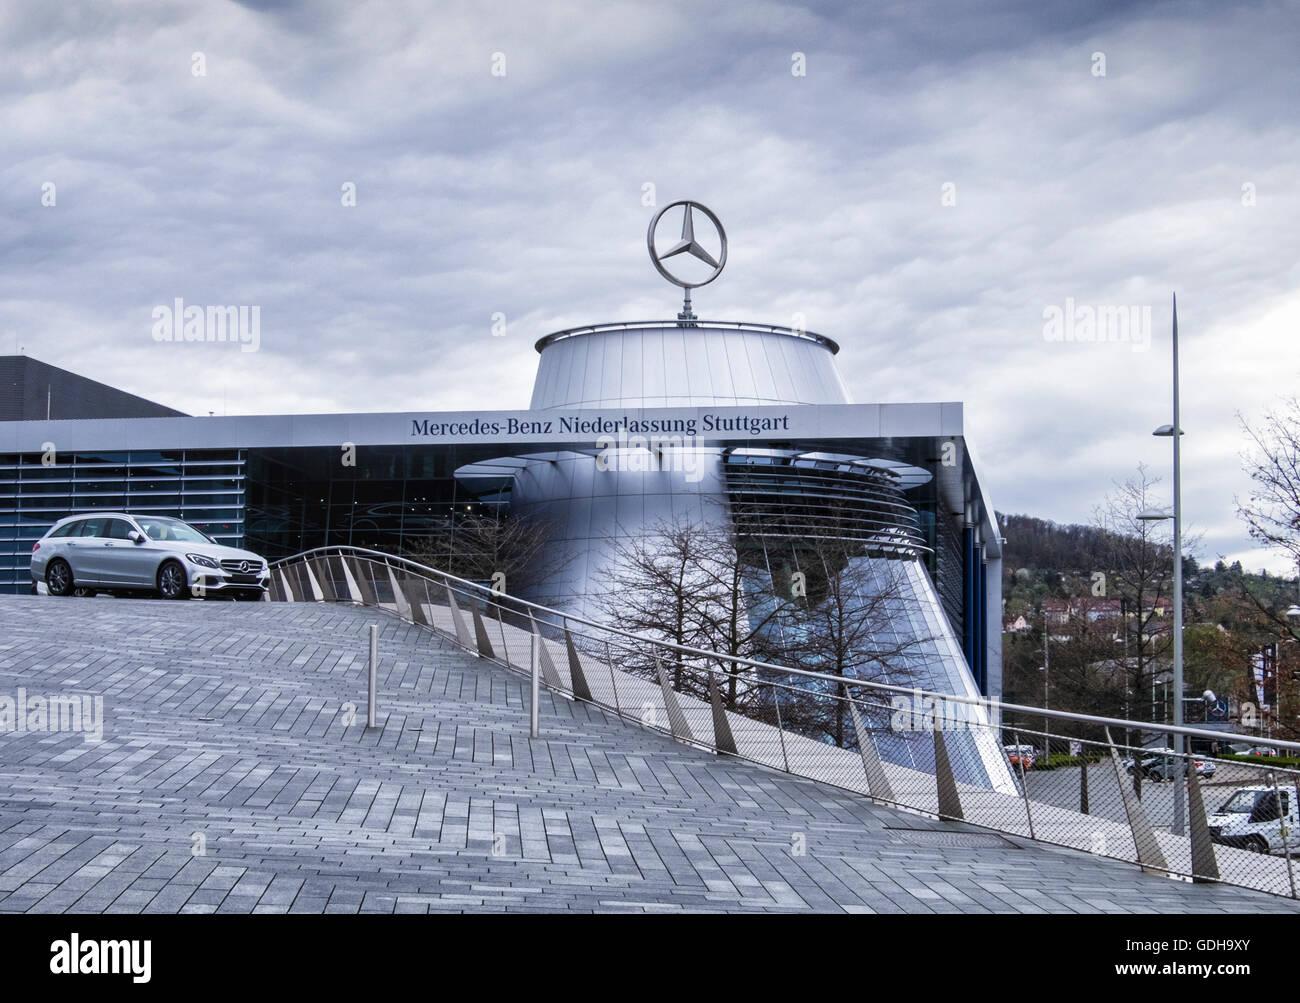 Mercedes Benz Sales Germany Stock Photos & Mercedes Benz Sales ...